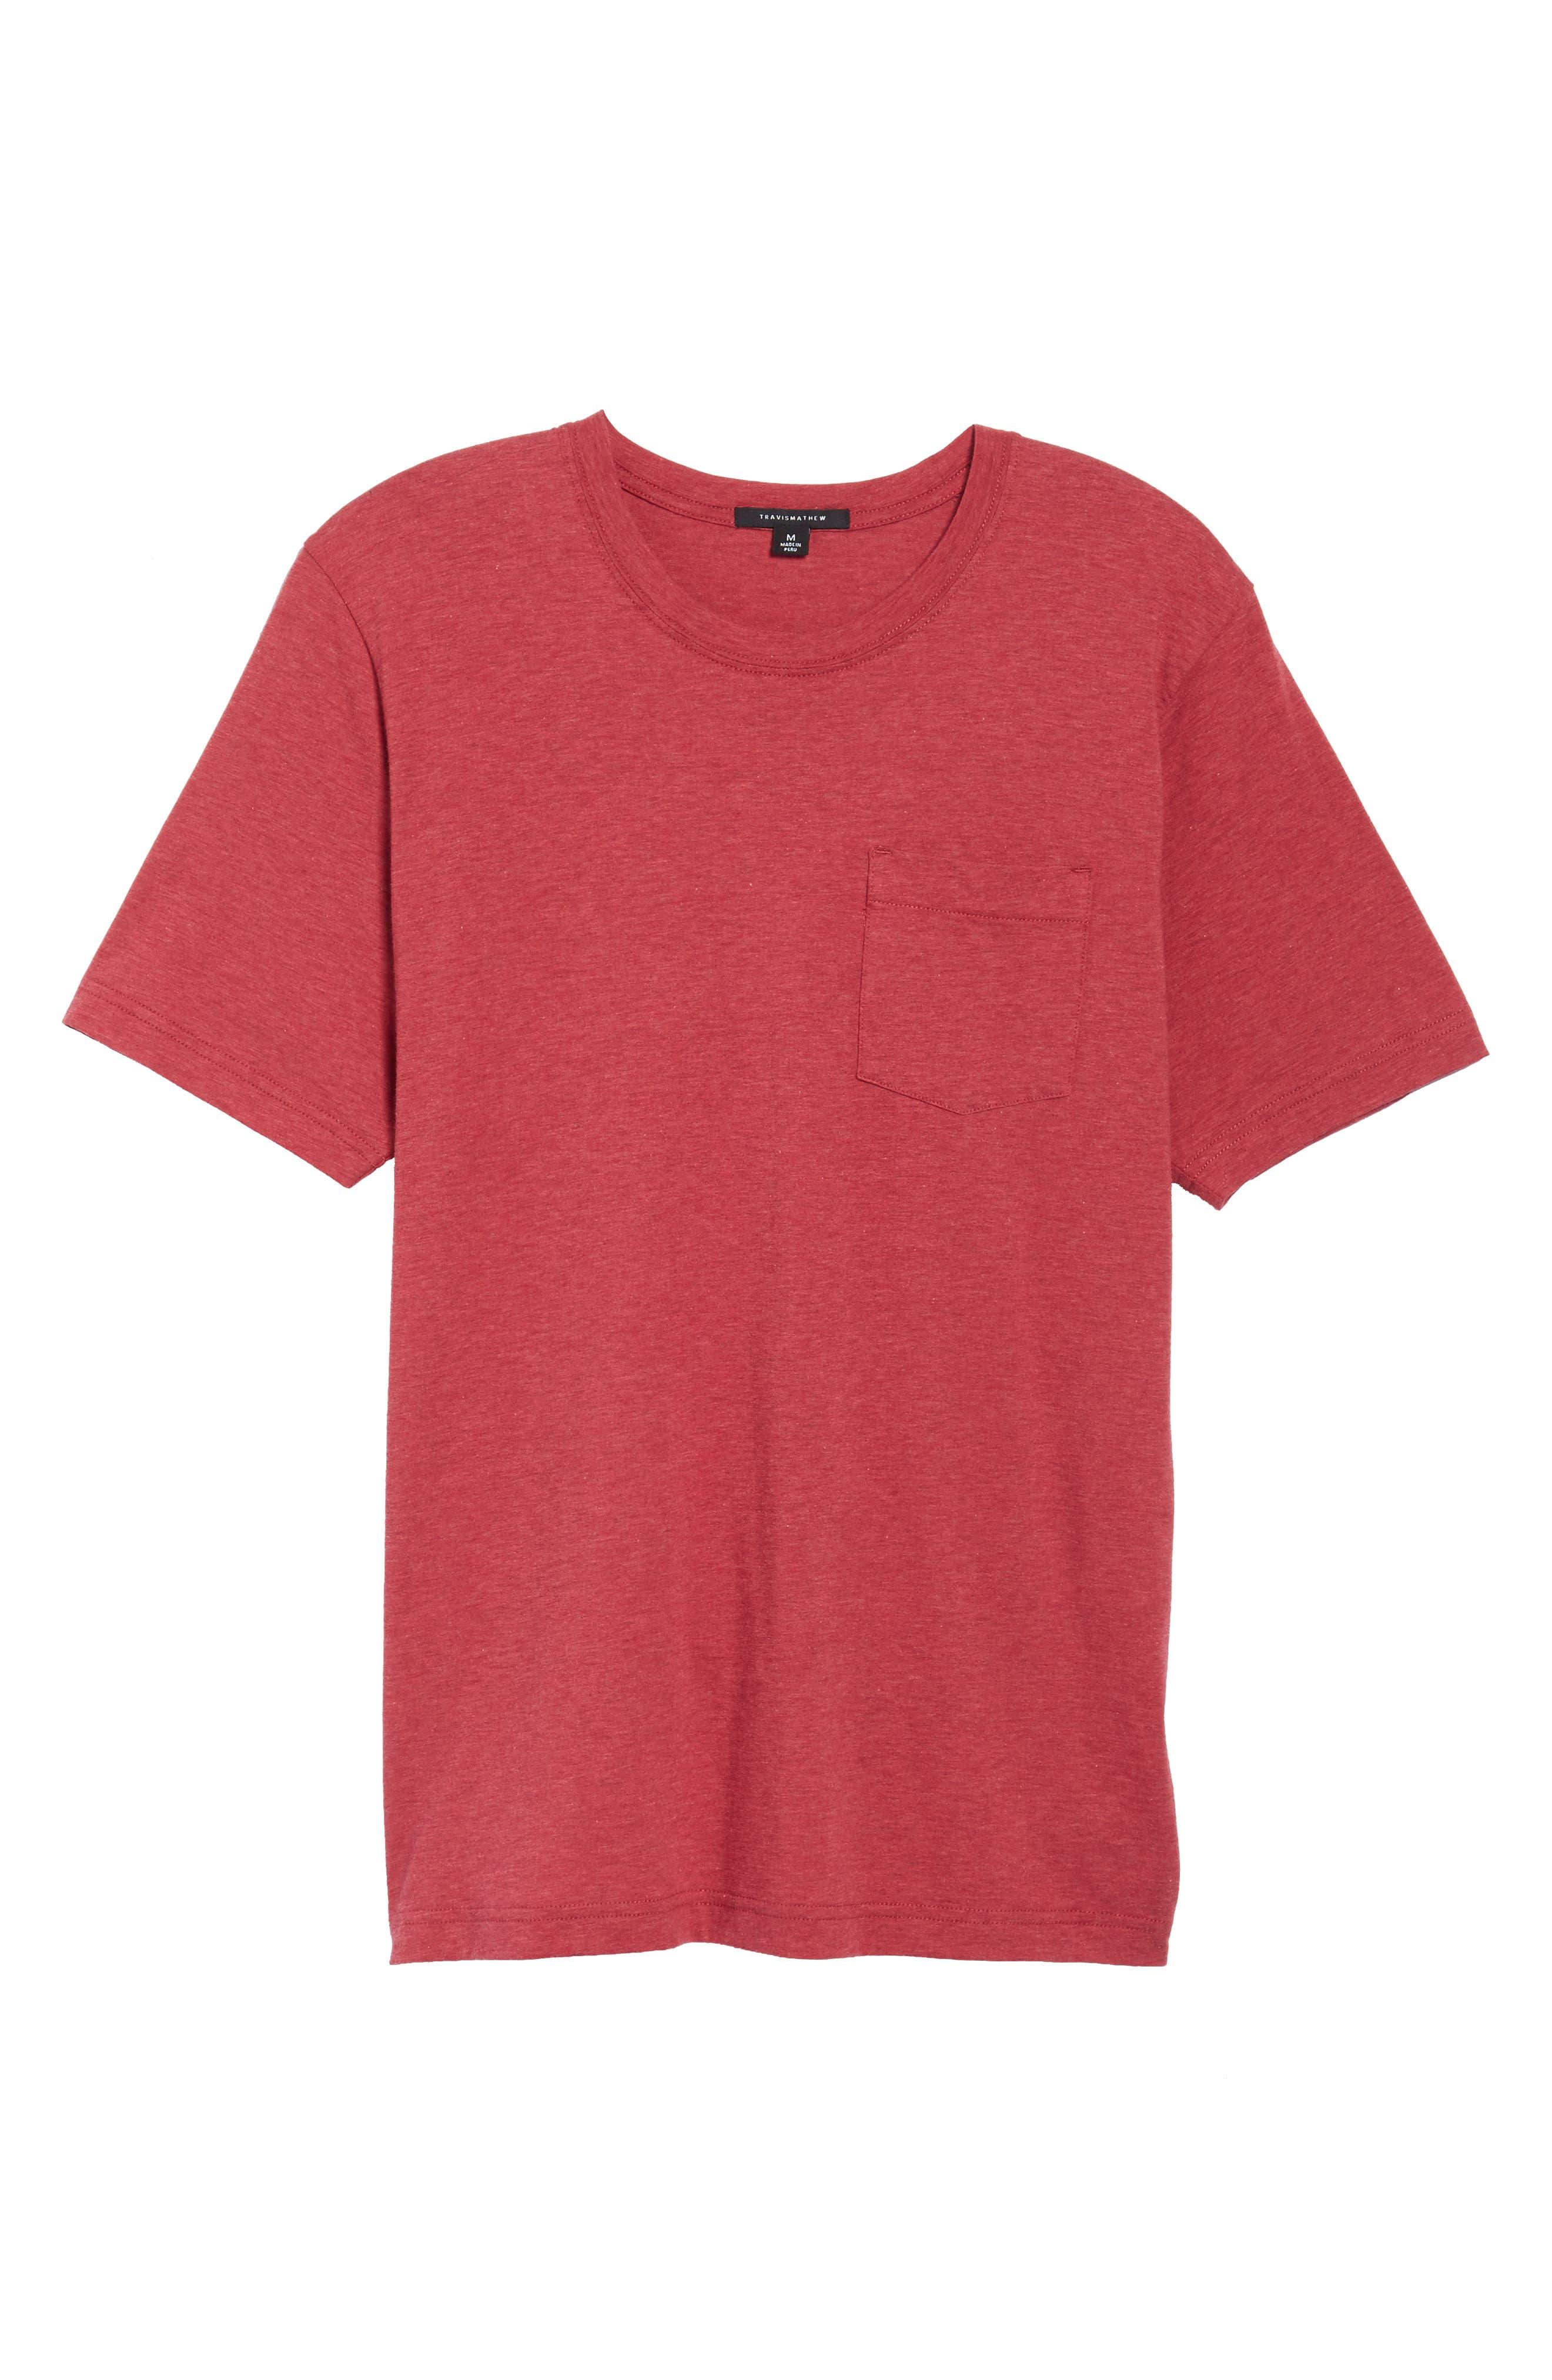 Hedrick T-Shirt,                             Main thumbnail 1, color,                             Heather Ox Blood